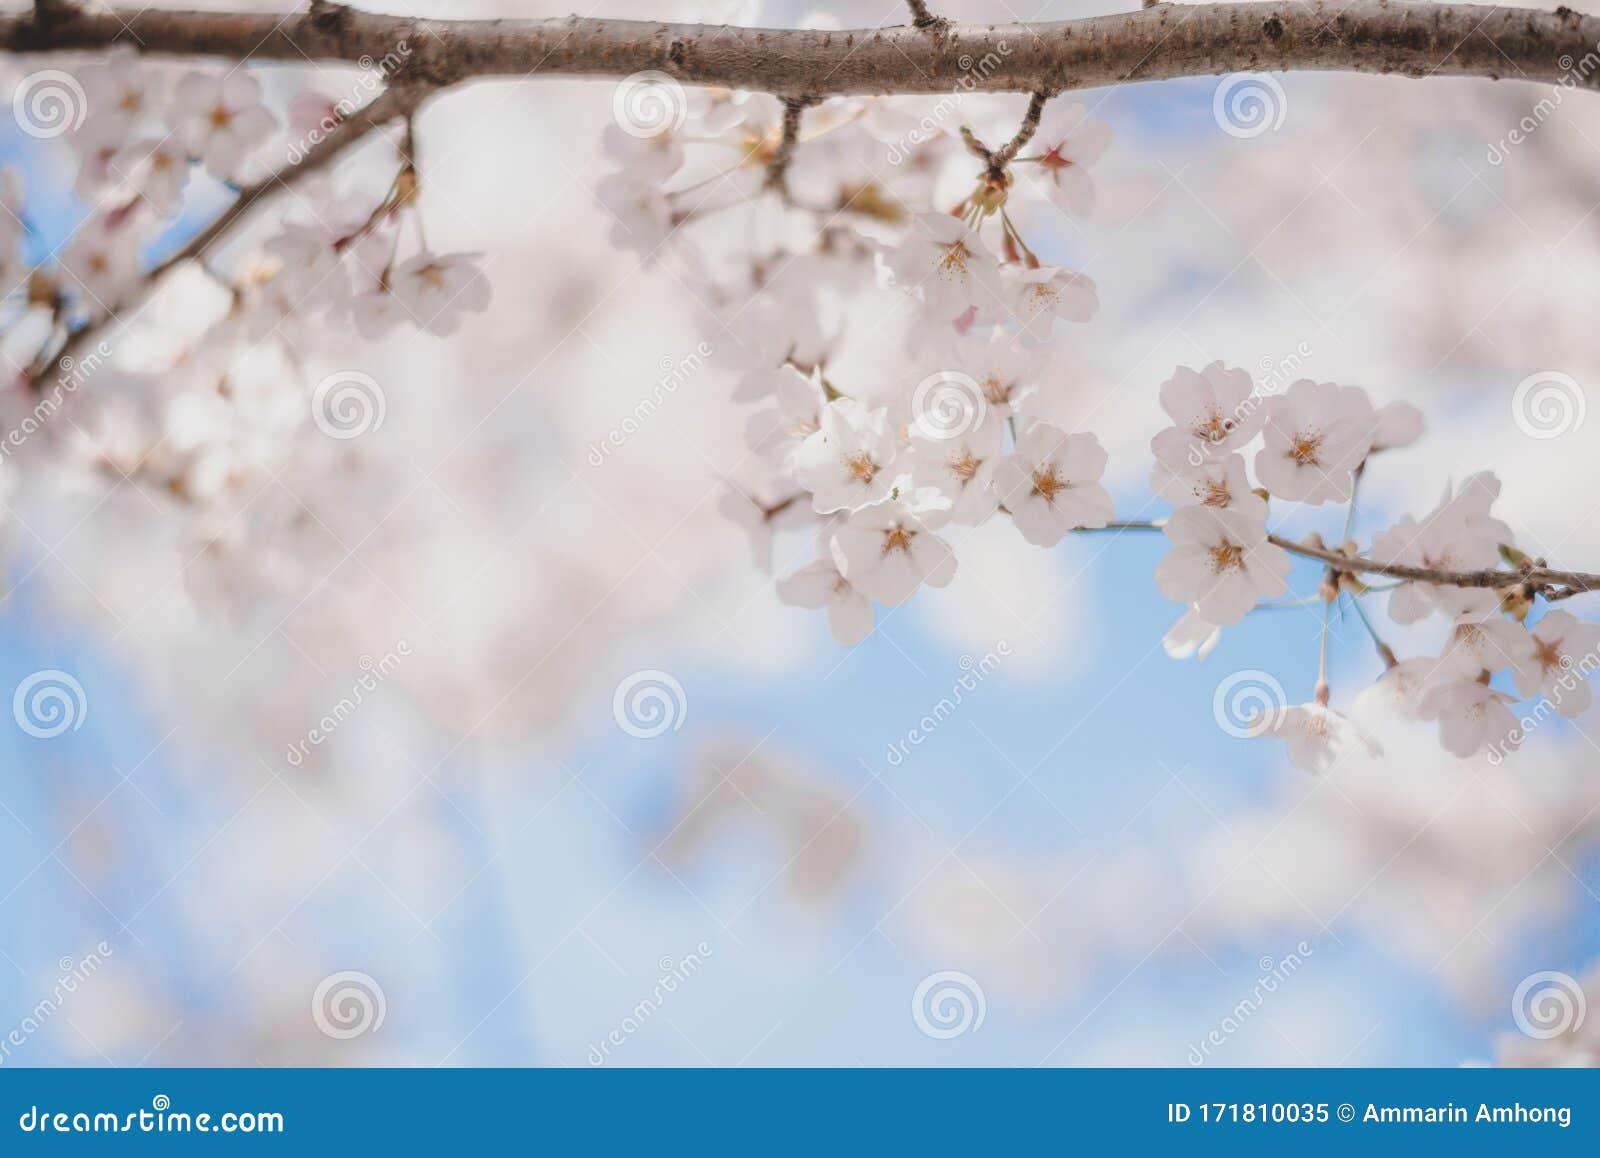 Dreamy Cherry Blossoms As A Natural Border, Studio ...